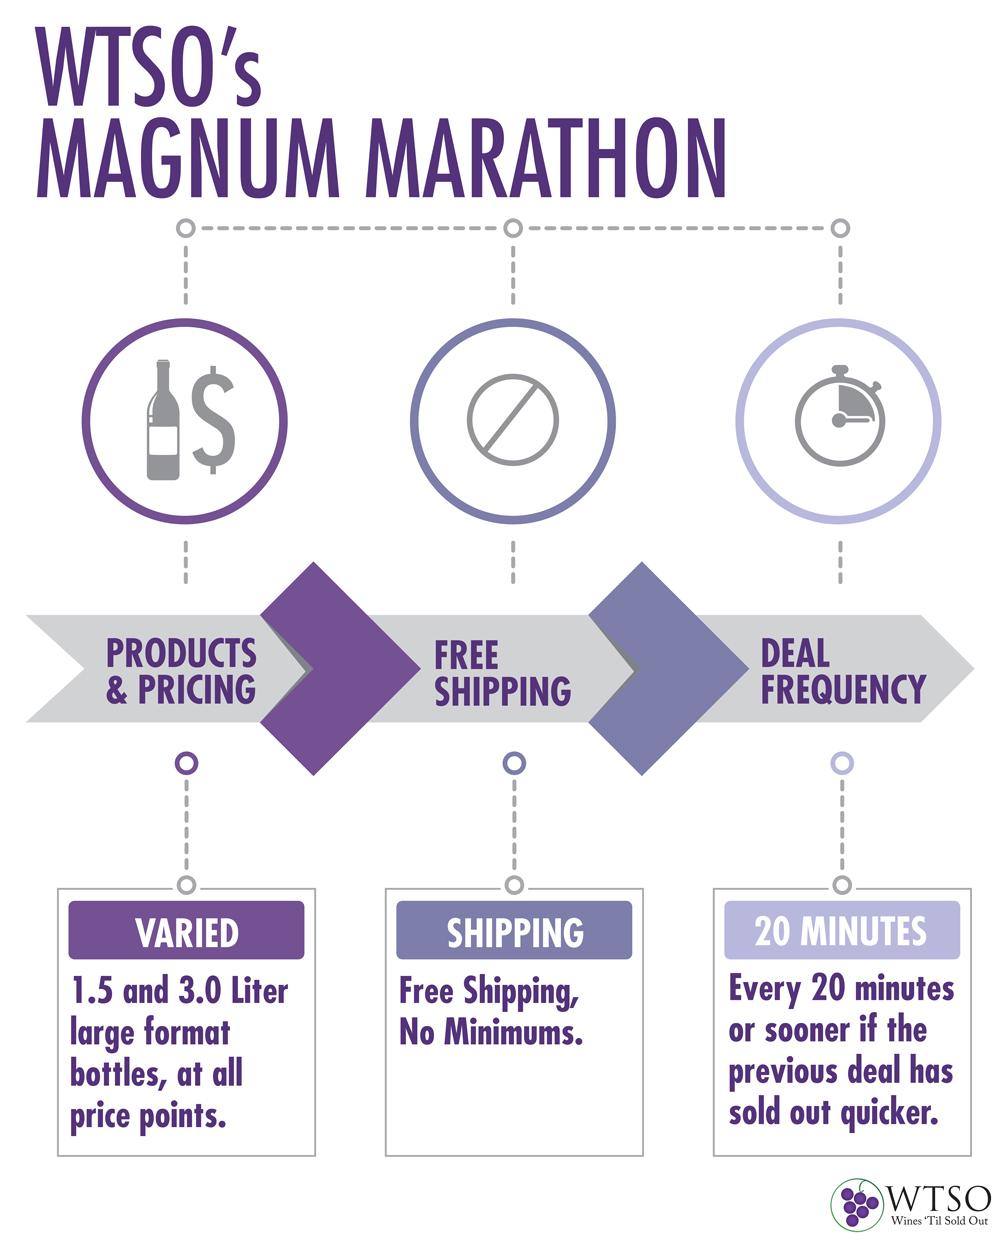 Nov 2 WTSO's Magnum Marathon: What You Need To Know